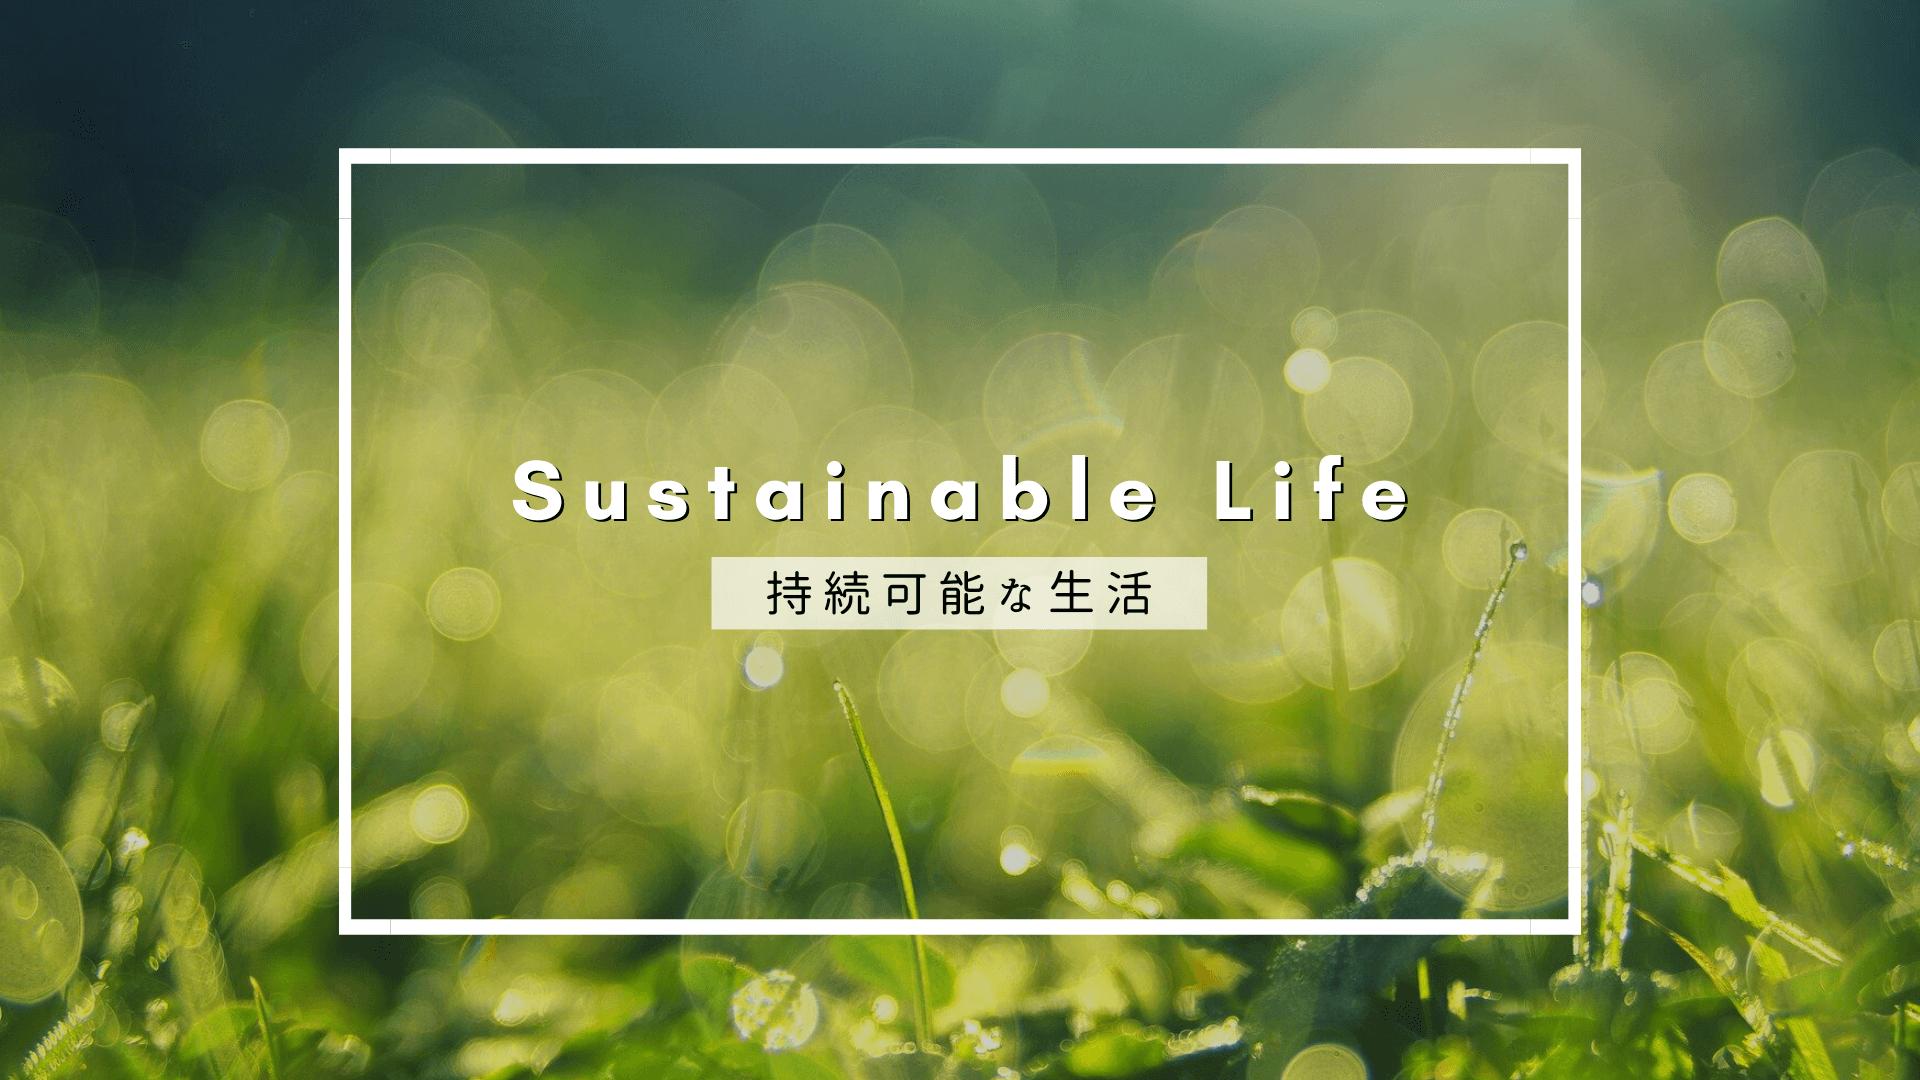 Sastainable Life 持続可能な生活